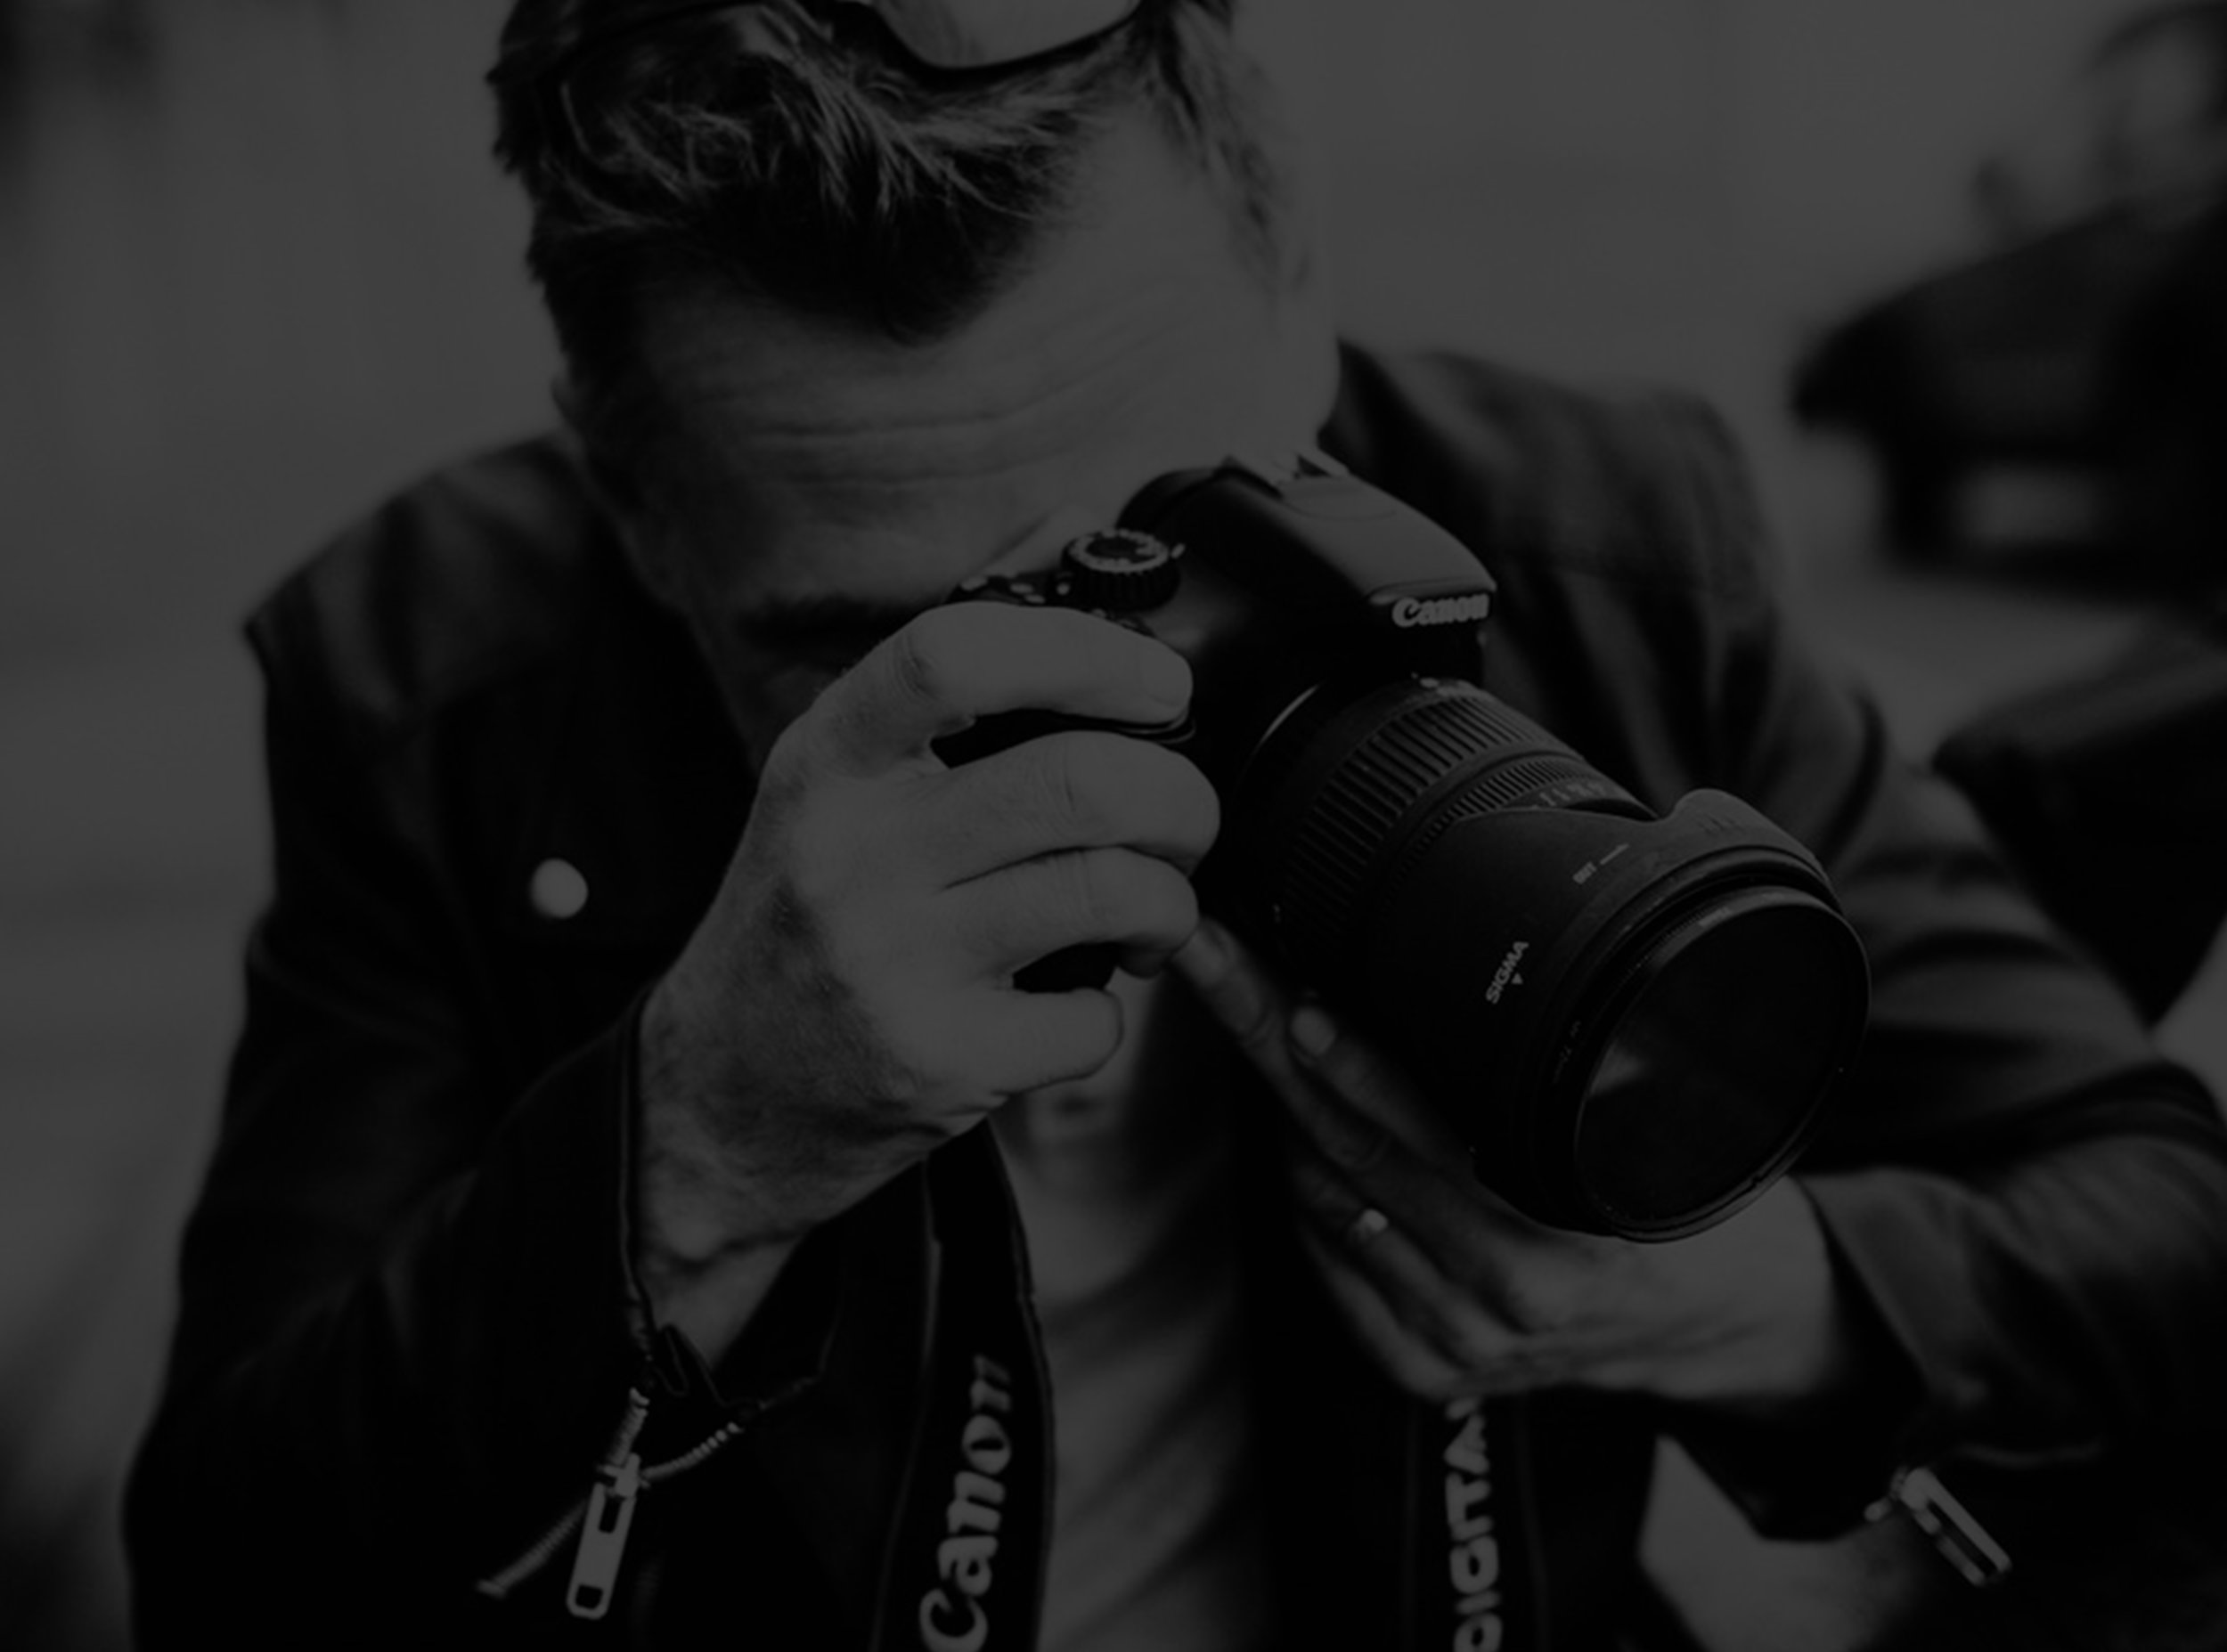 PHOTO/VIDEO -